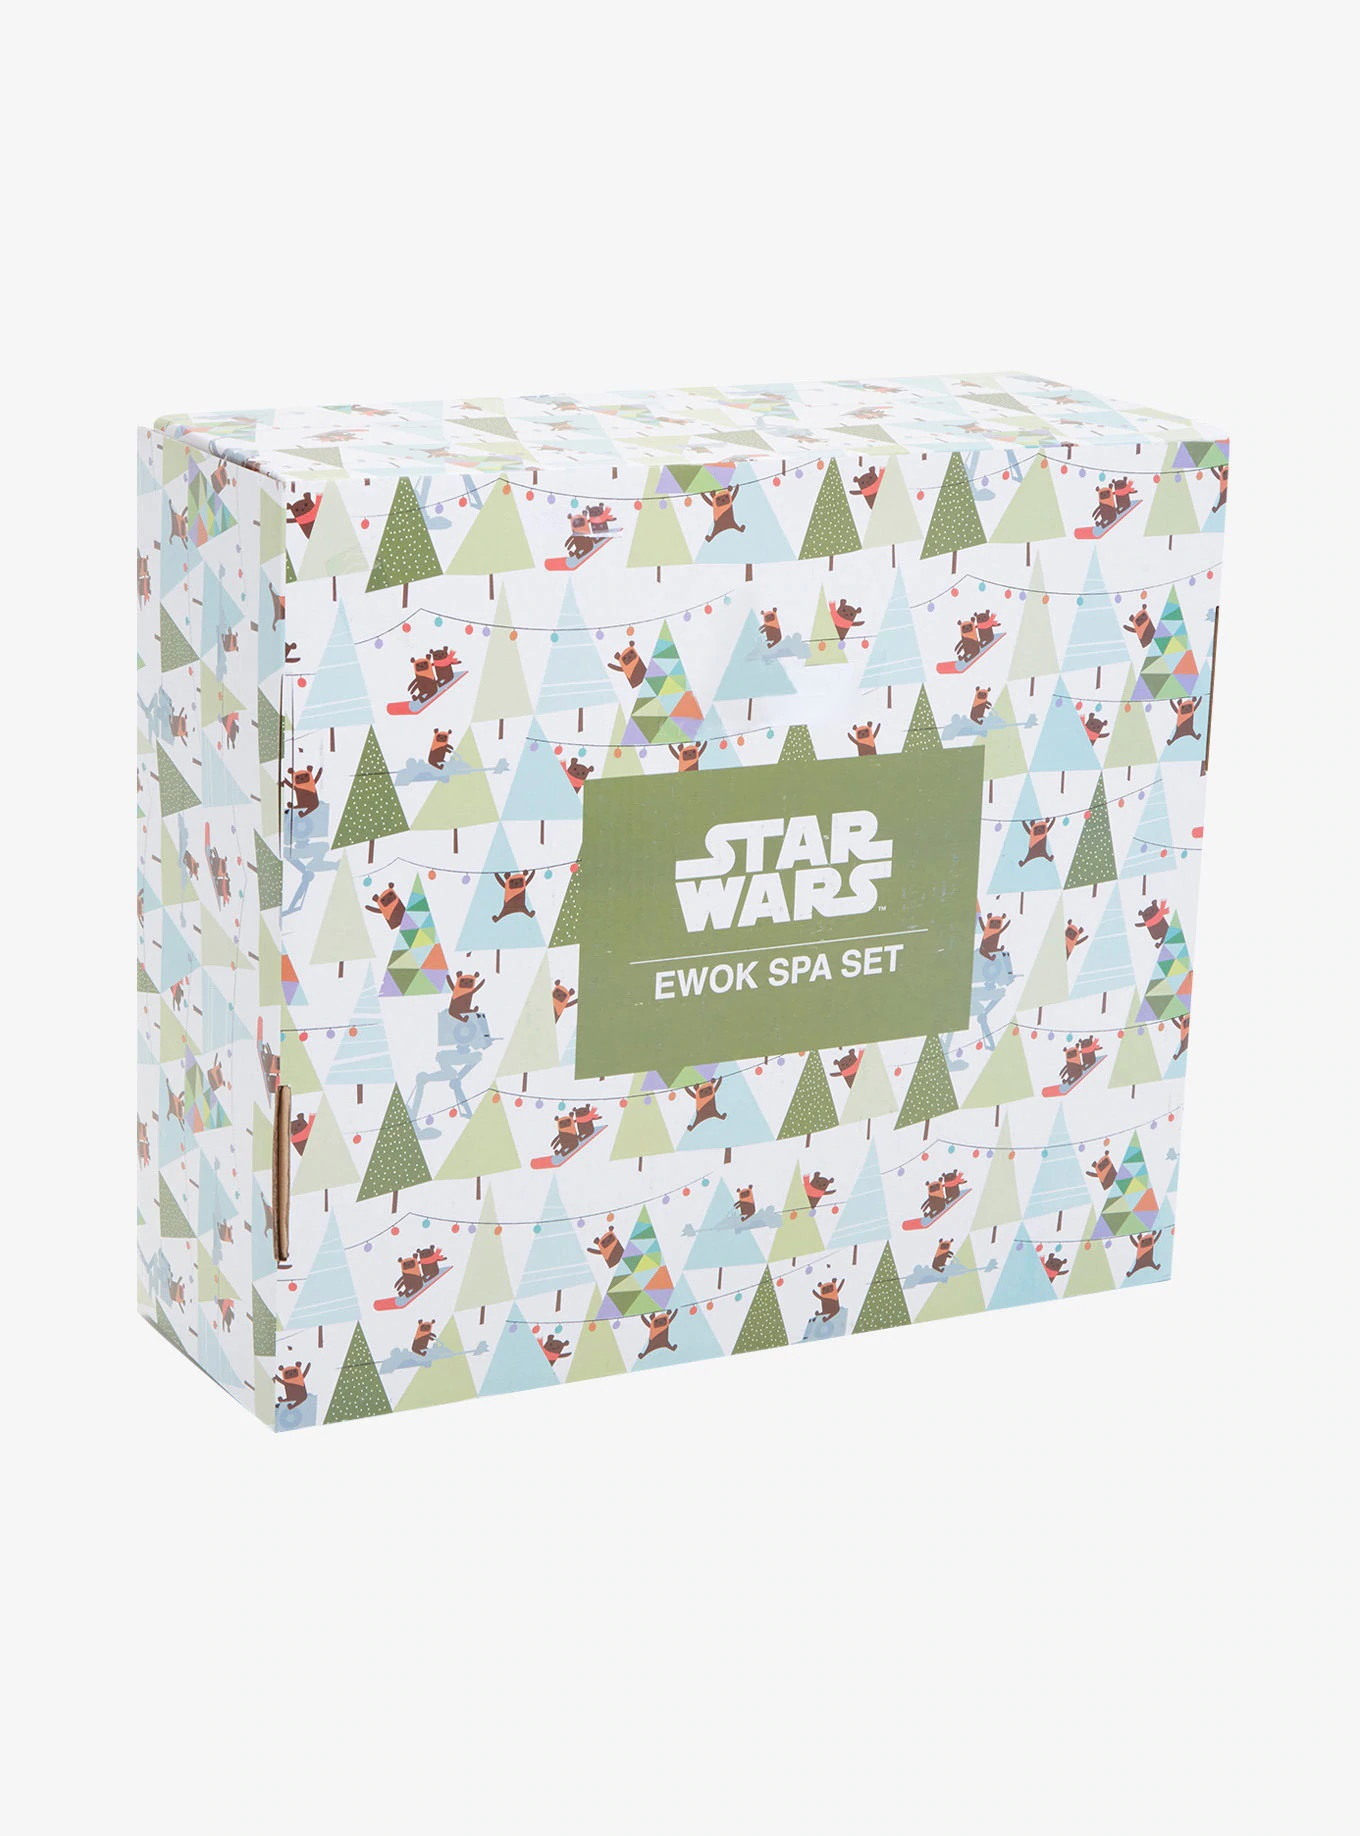 Star Wars Ewok Spa Robe Gift Set at Box Lunch